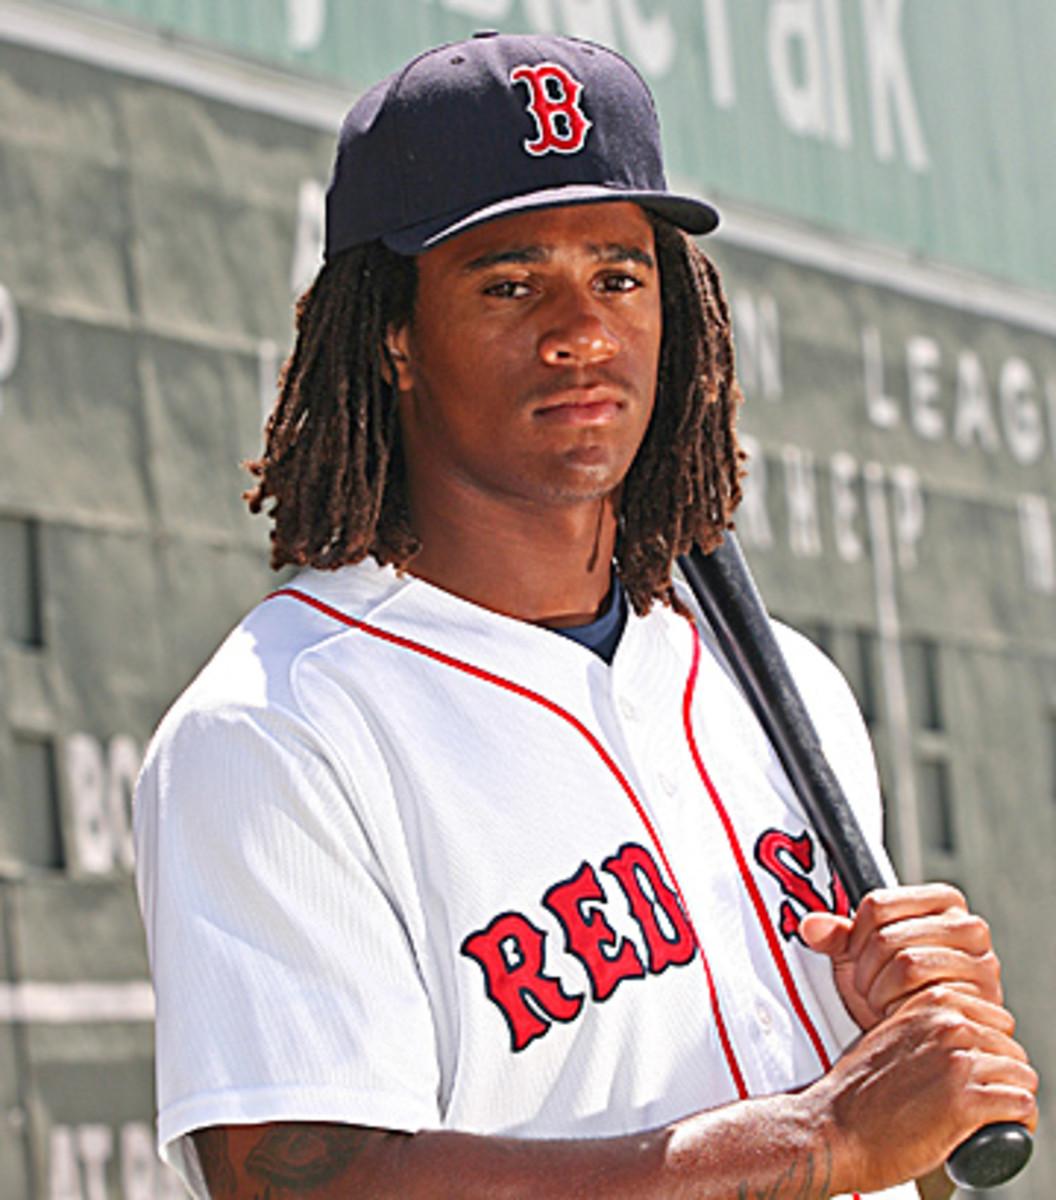 Photo by Ethan Faggett/Boston Red Sox